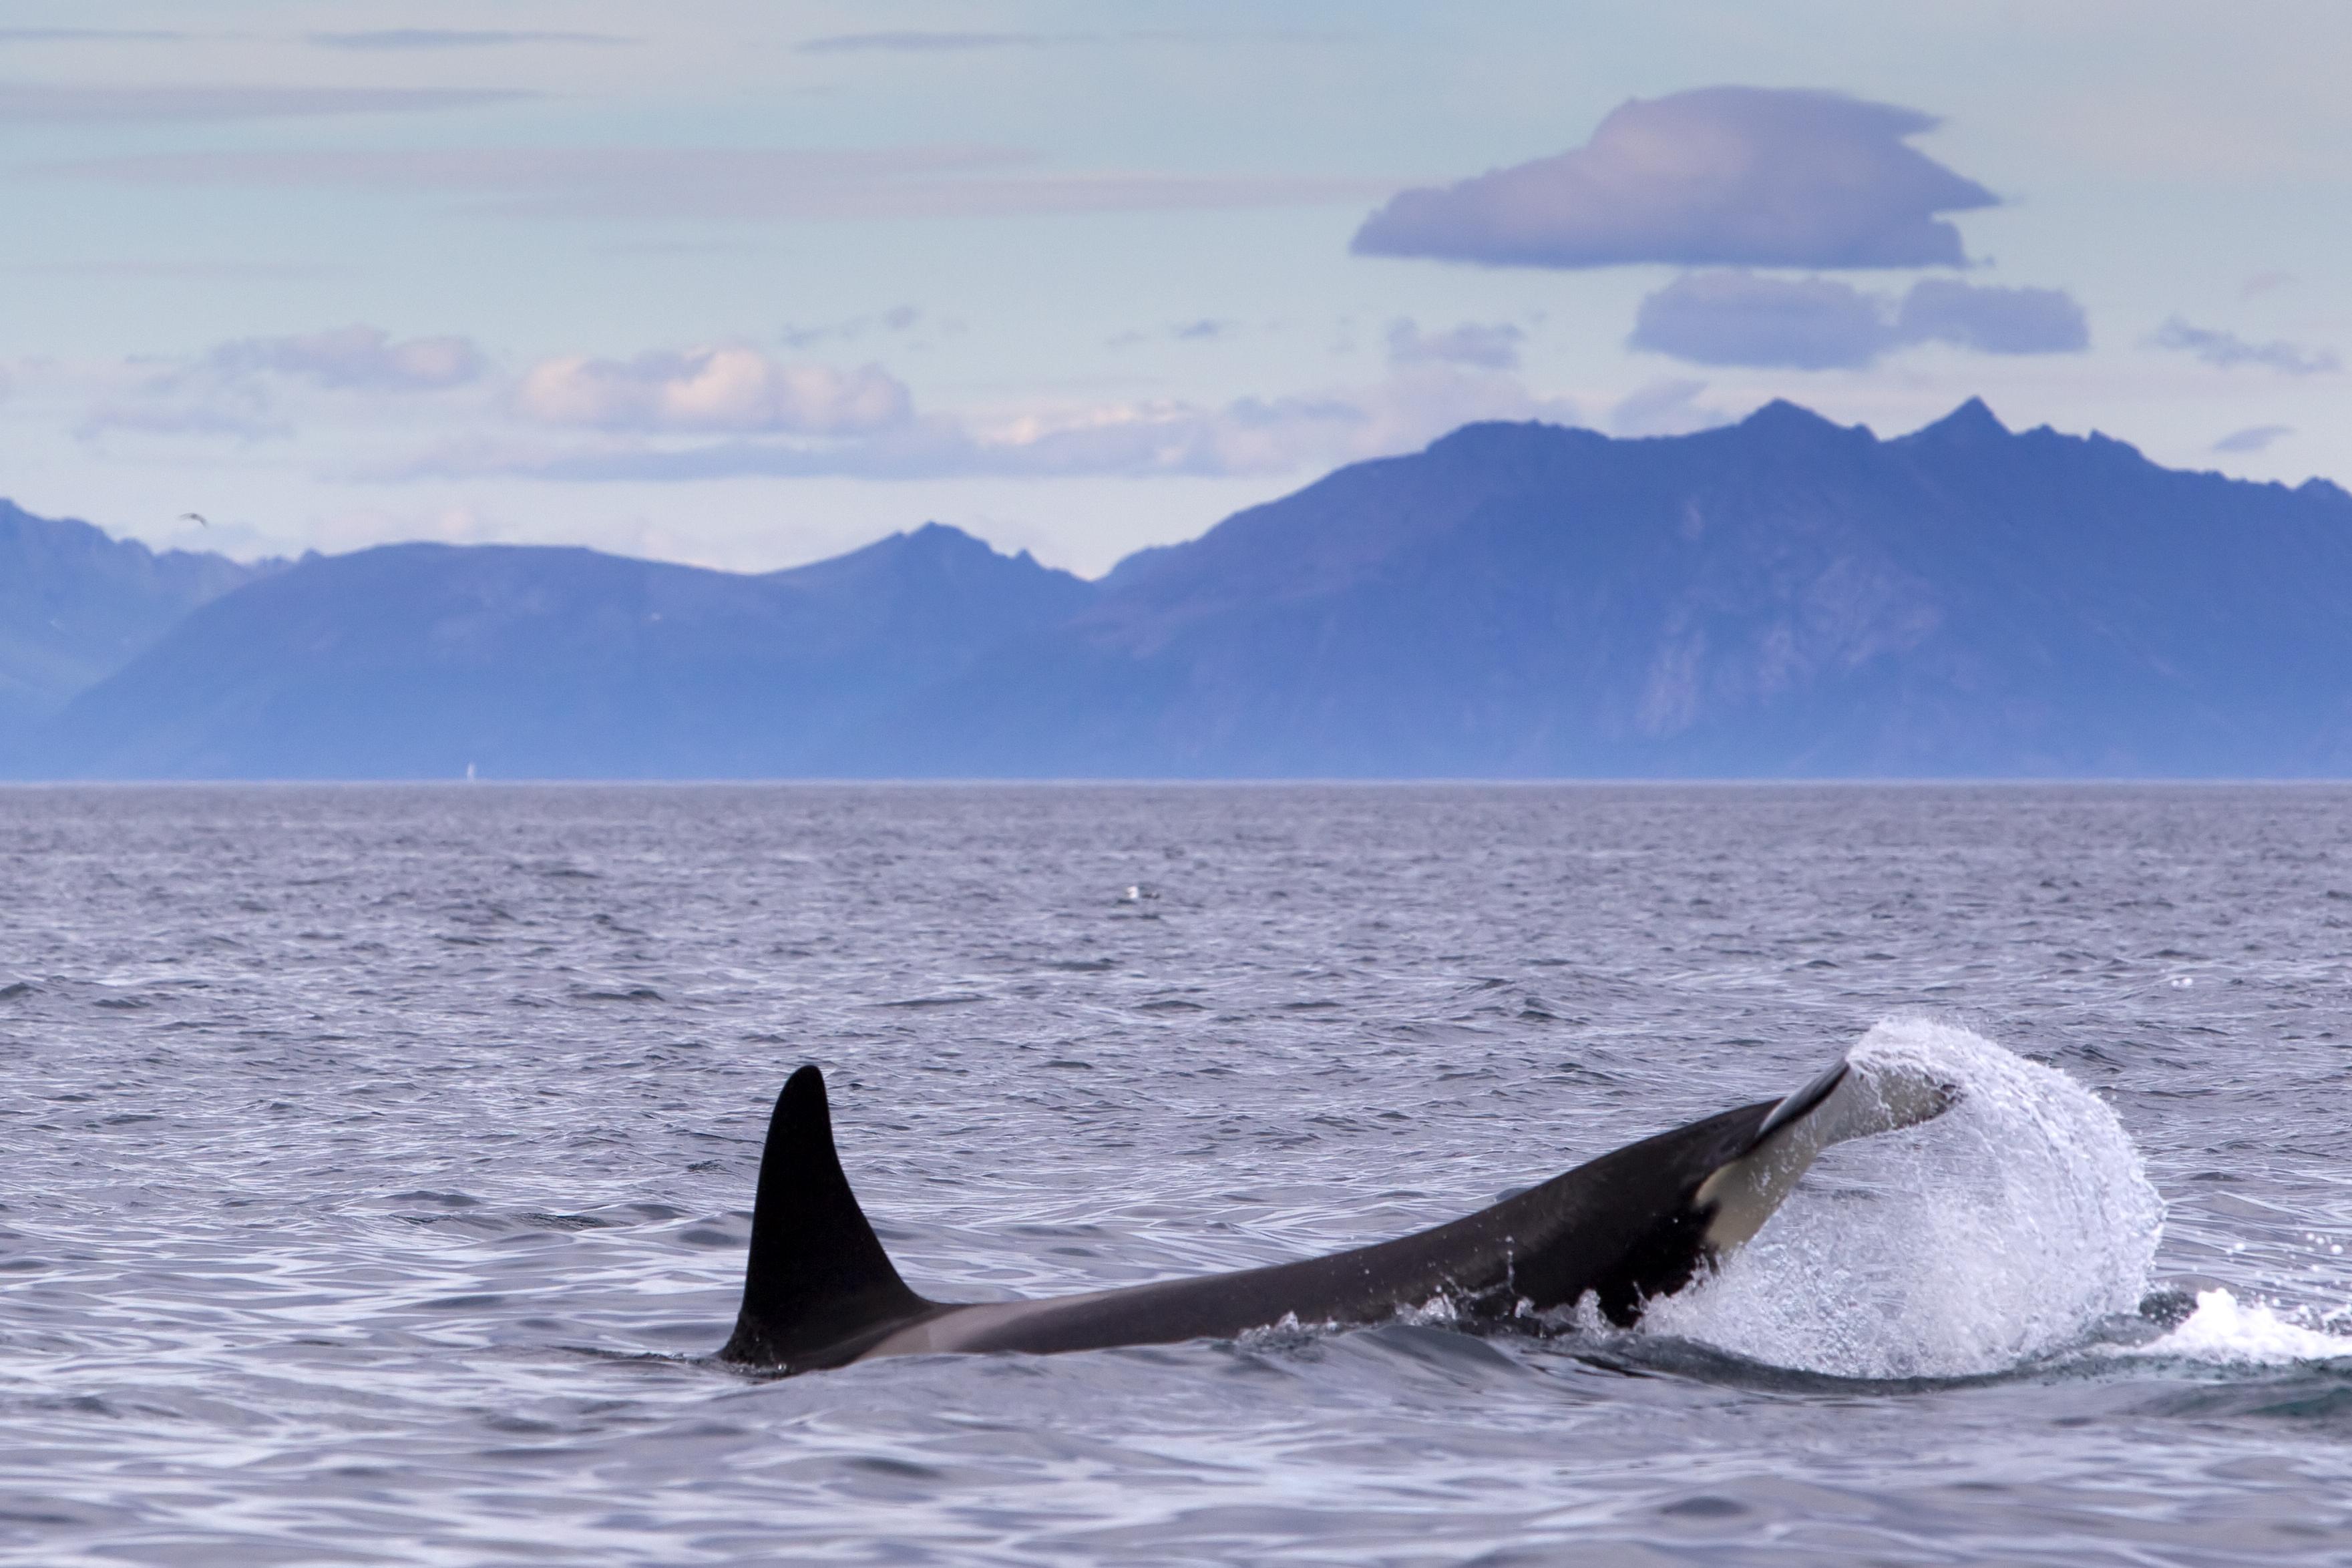 Whale in Arctic Ocean